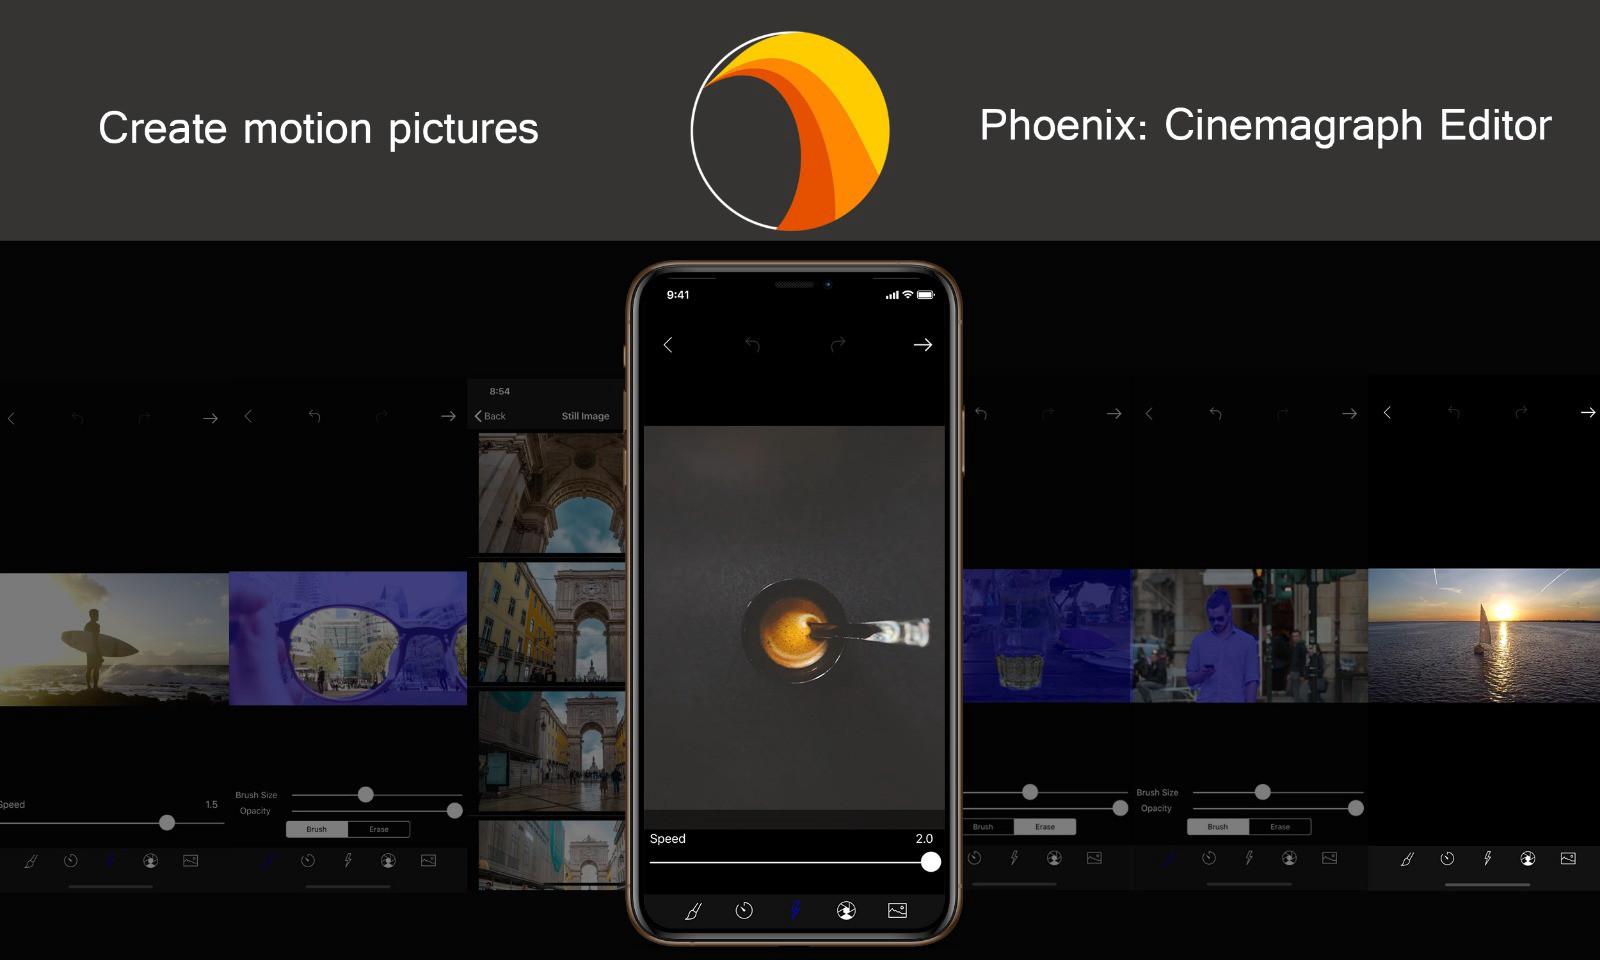 1 cq7vioUahBPsEtwp4Z8mQg - تطبيق Phoenix لتحرير الفيديو وجعل بعض أجزاء المشهد متحركة والأخرى ثابتة